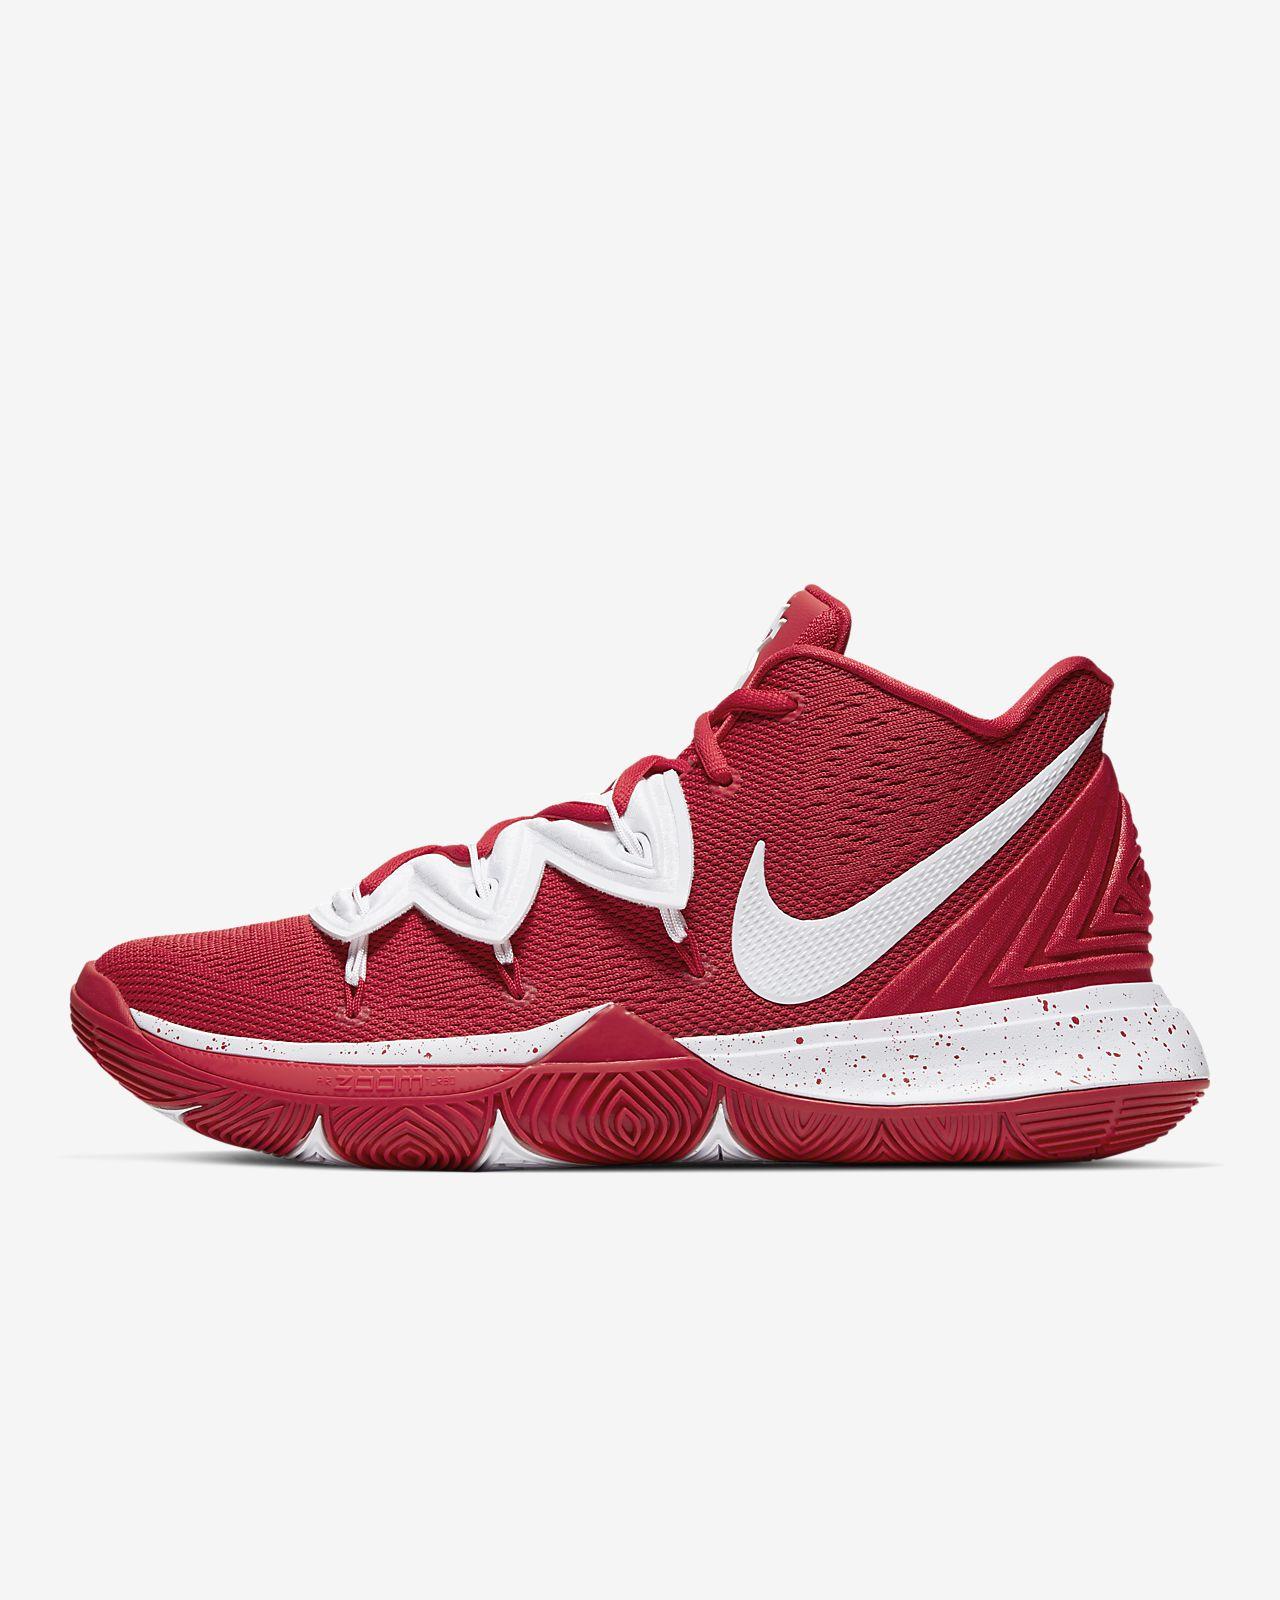 Kyrie 5 (Team) Shoe